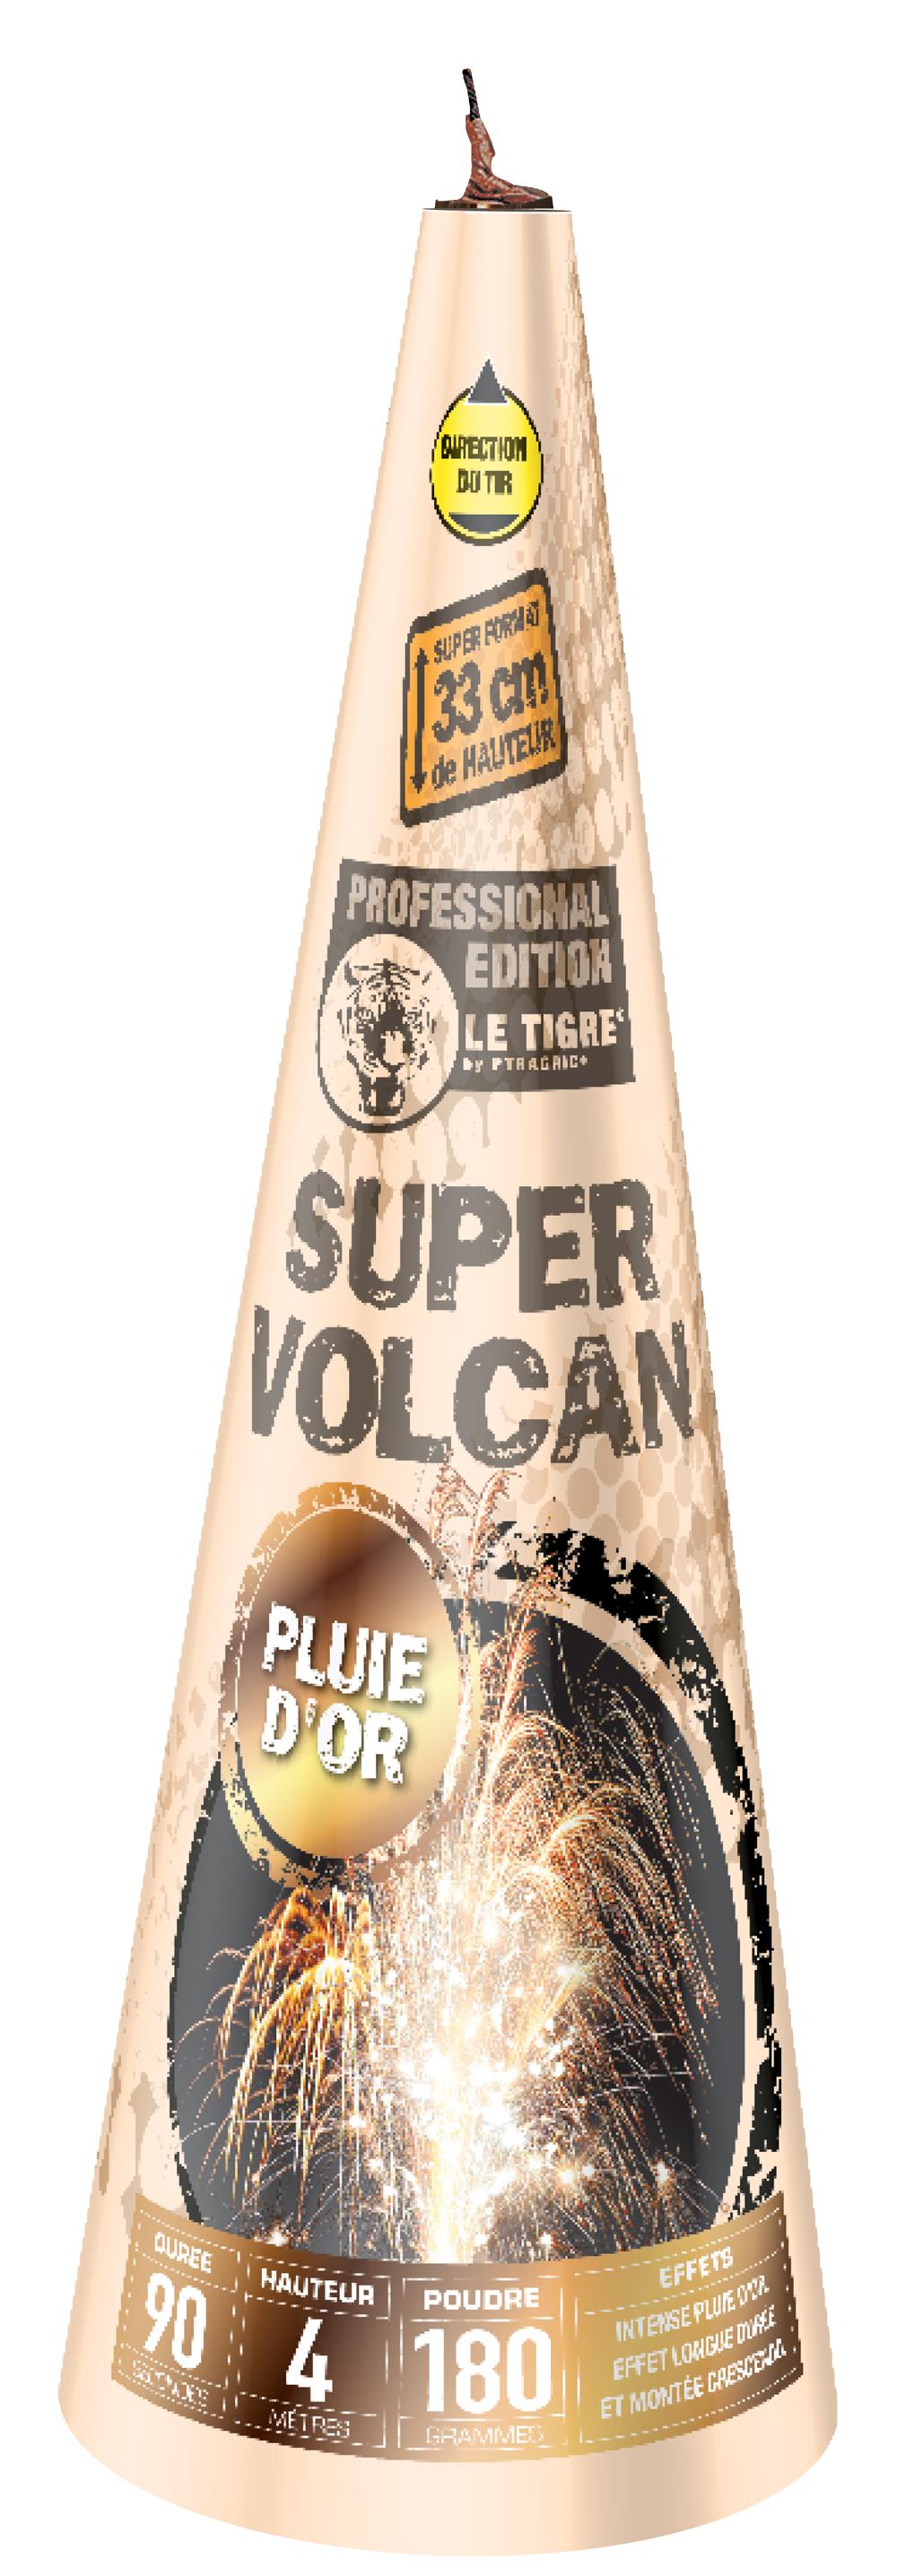 P154473--volcan-3D-pluie-d-or